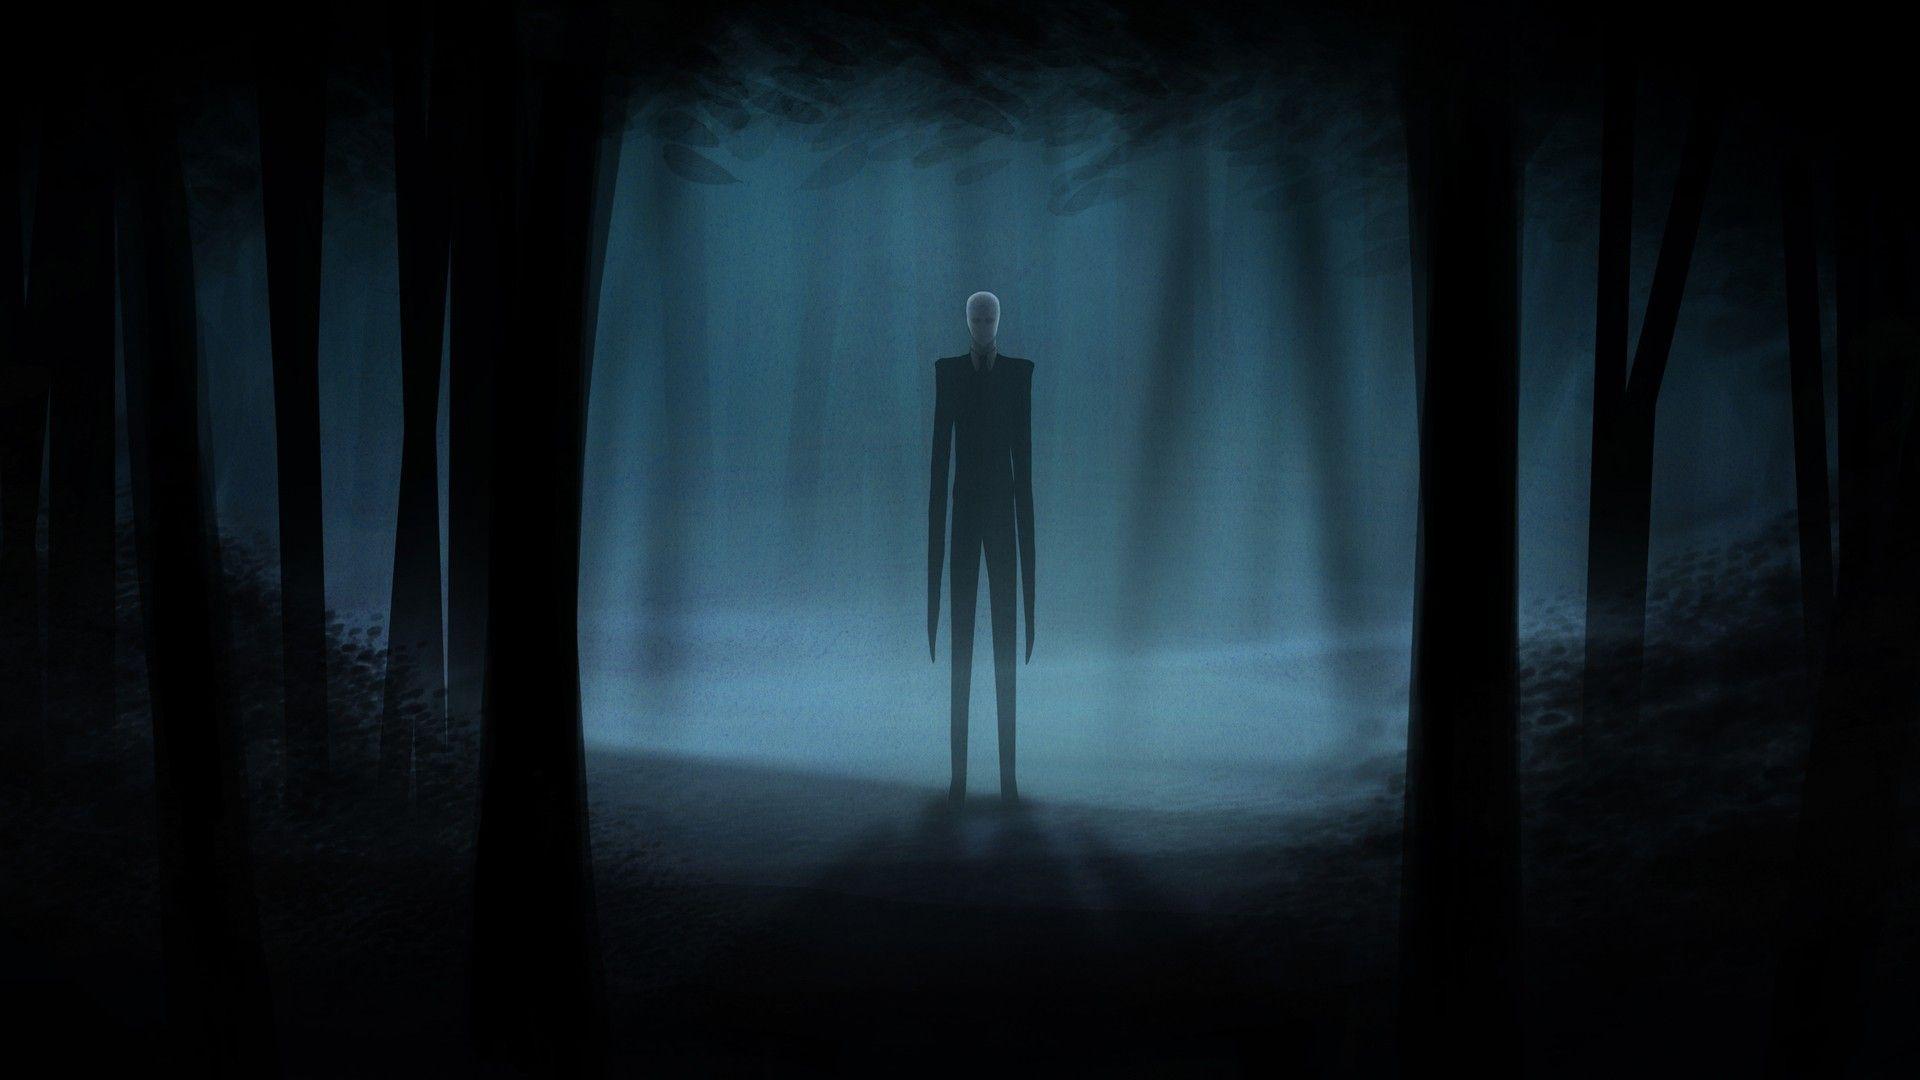 spooky background photos